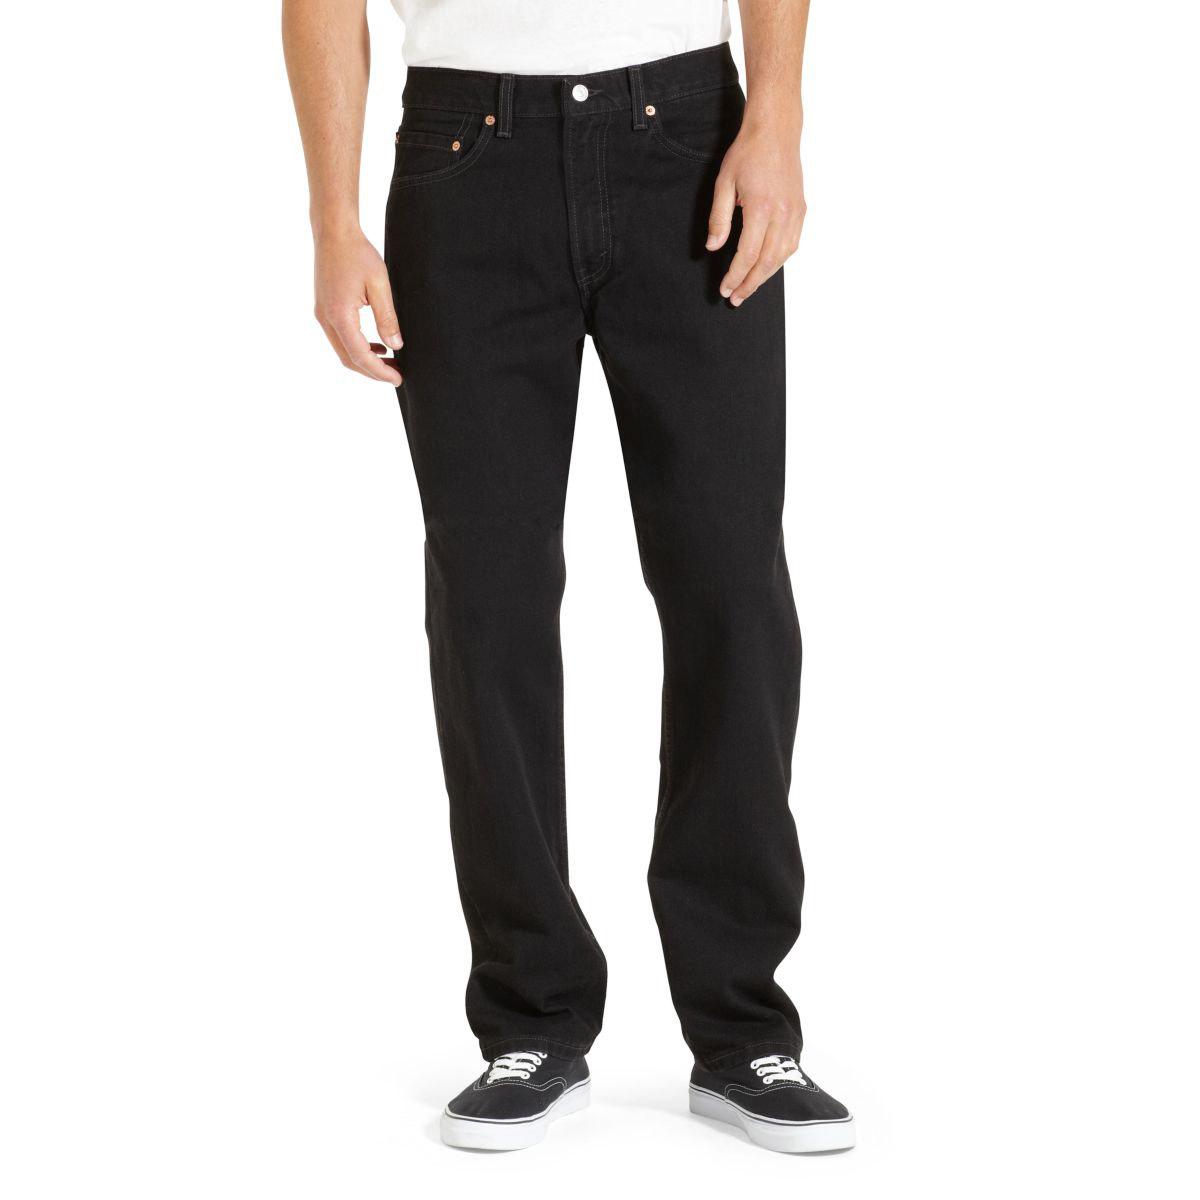 Levi's Men's 505 Regular Fit Jeans - Black, 36/29